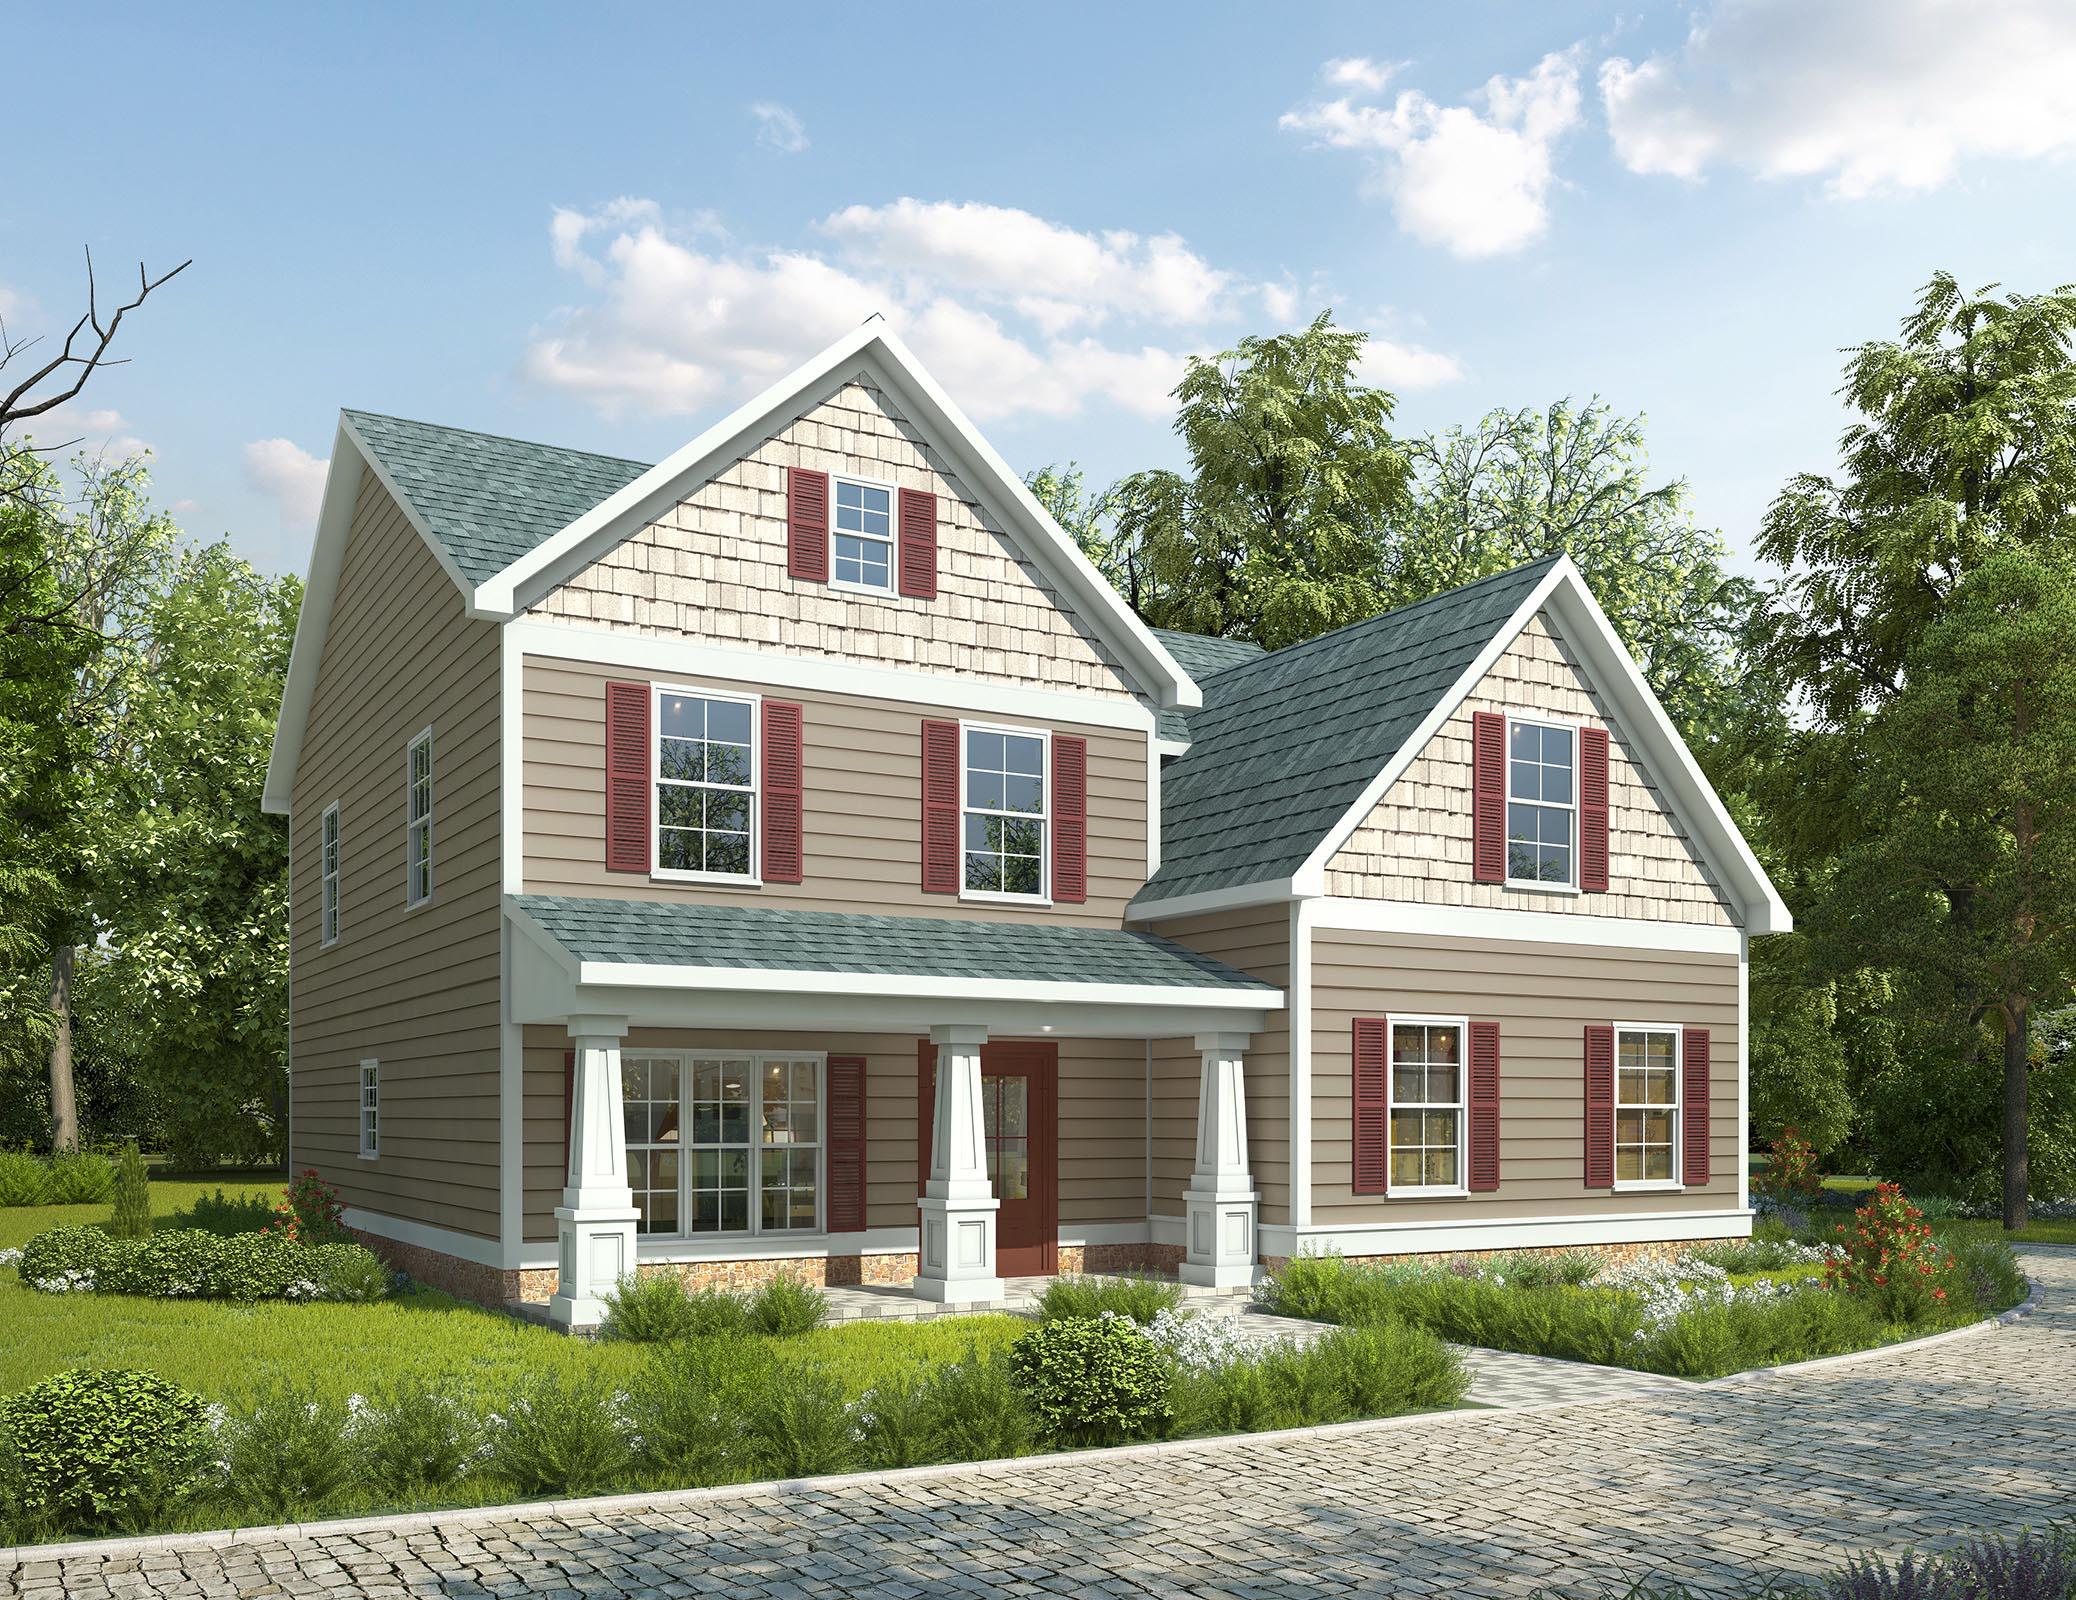 Narrow lot craftsman house plan 36036dk 2nd floor for Craftsman style house plans for narrow lots